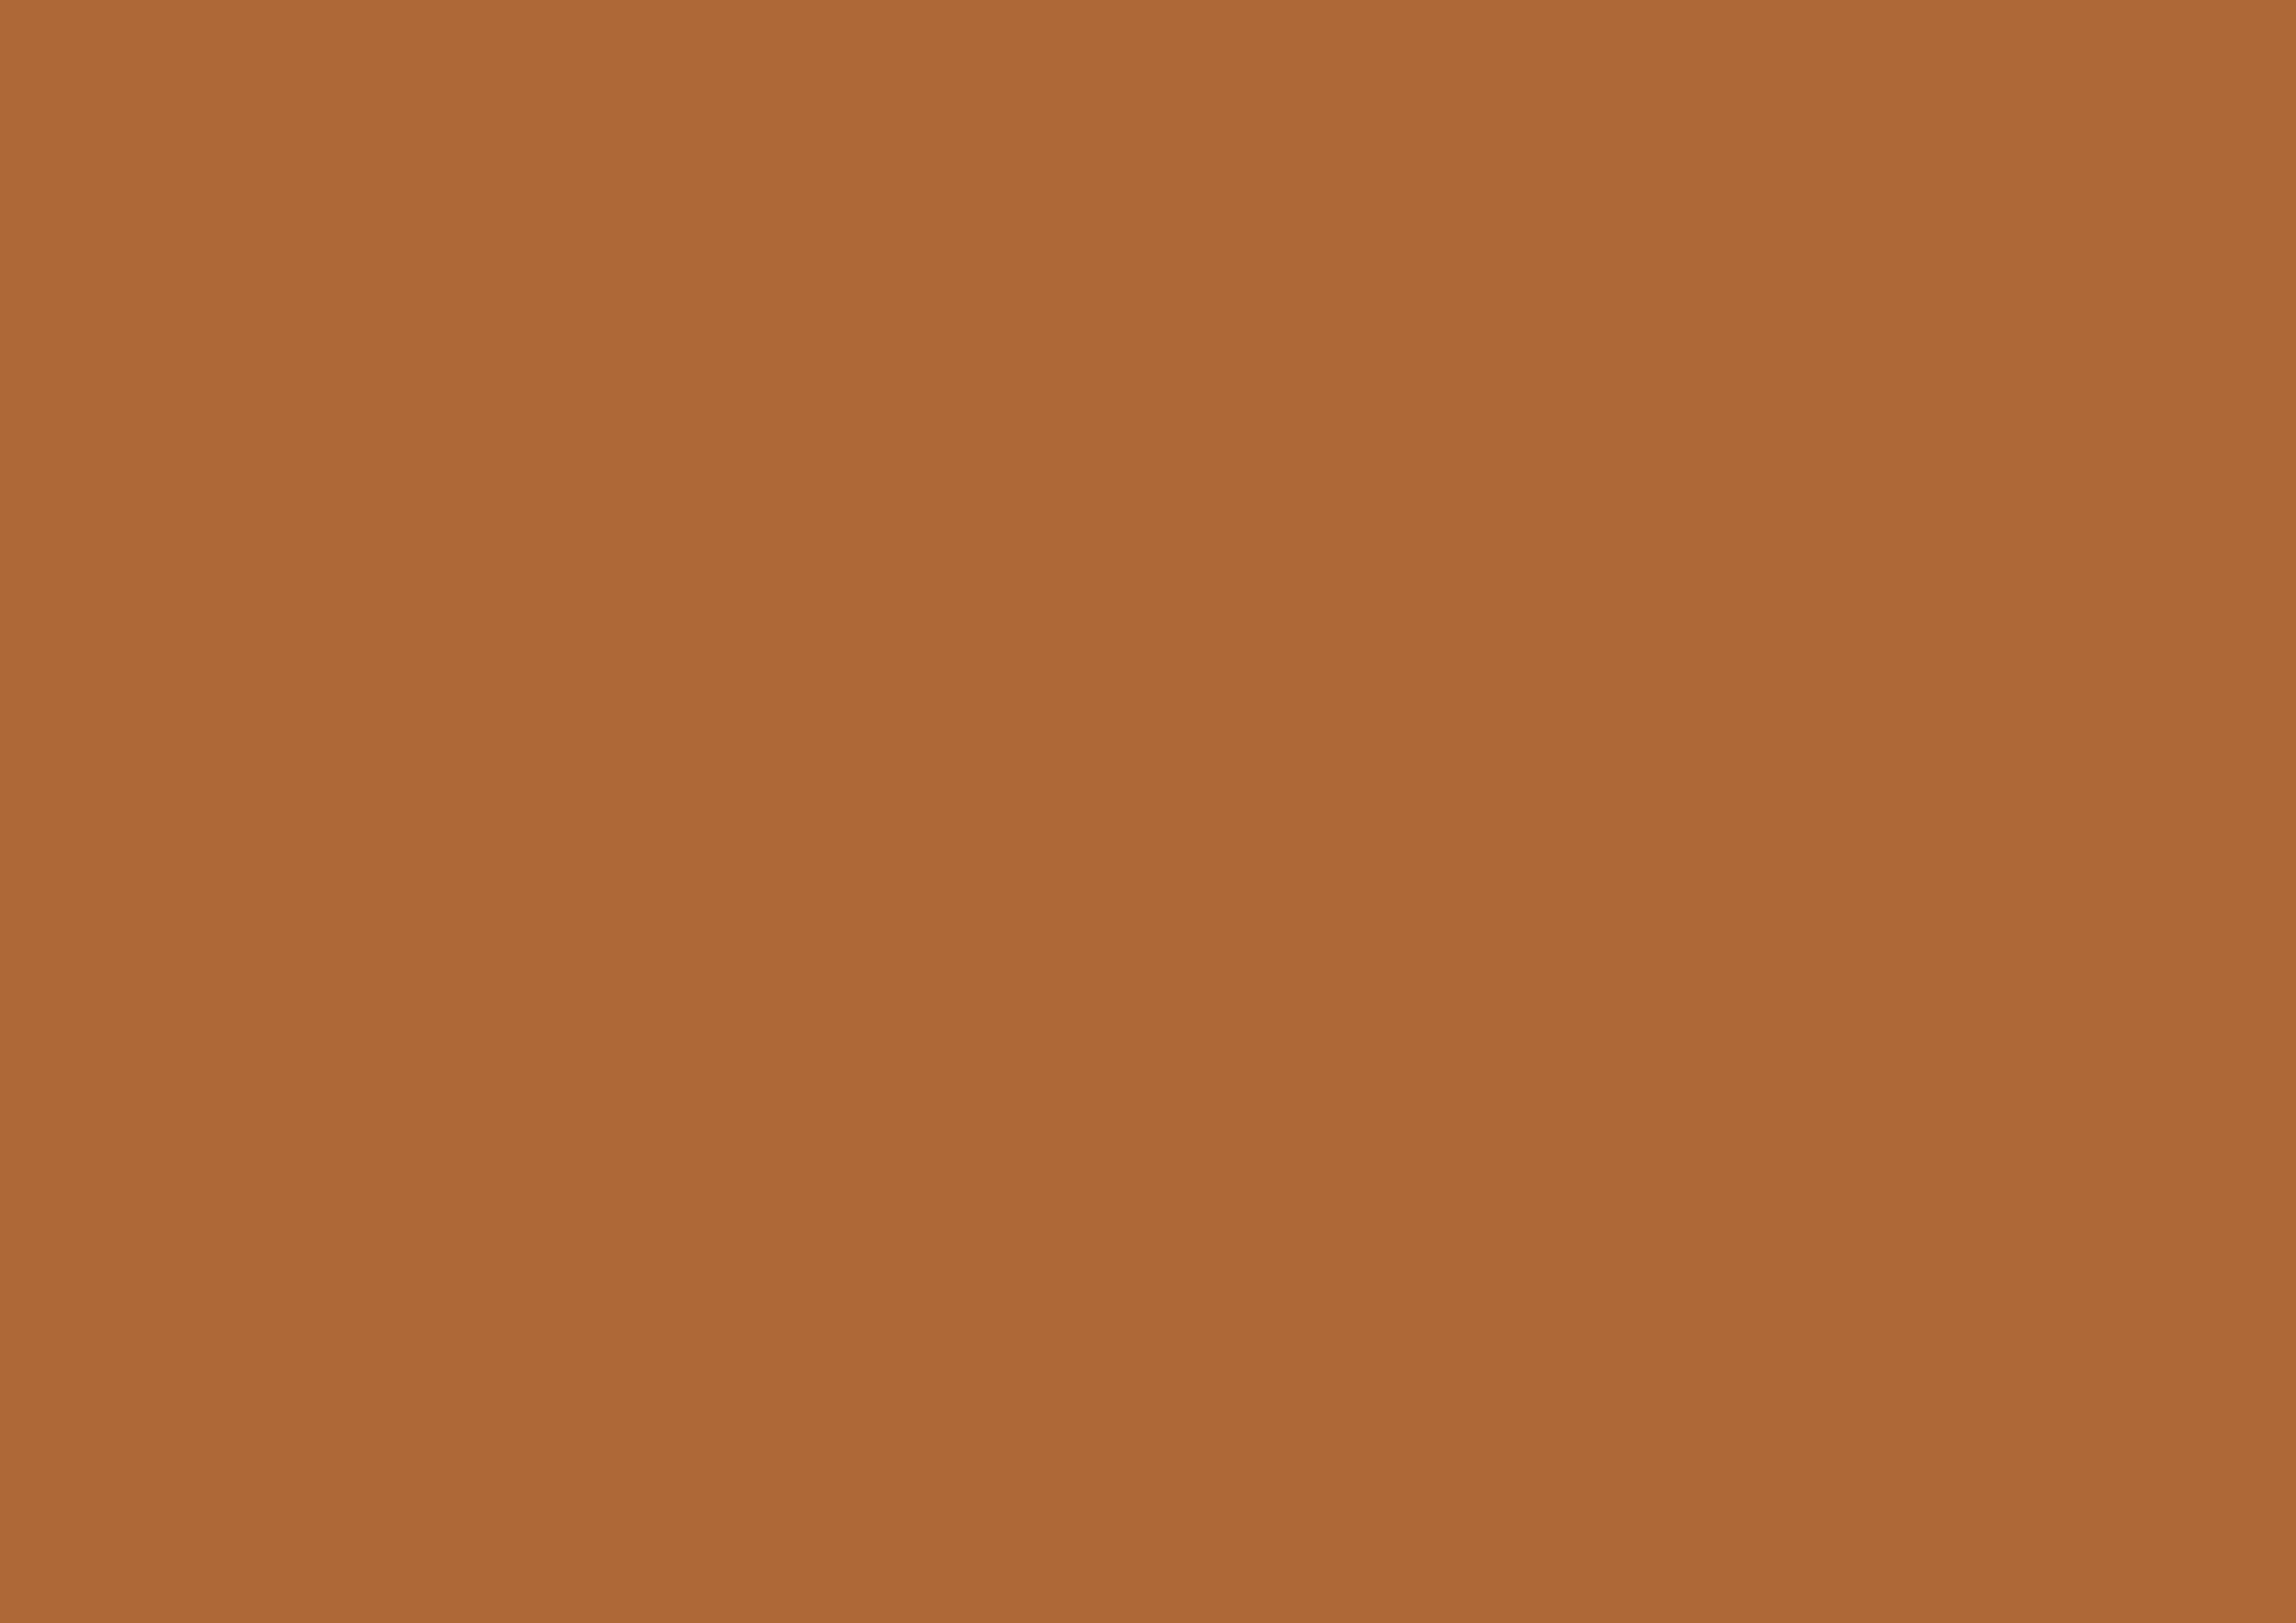 3508x2480 Windsor Tan Solid Color Background